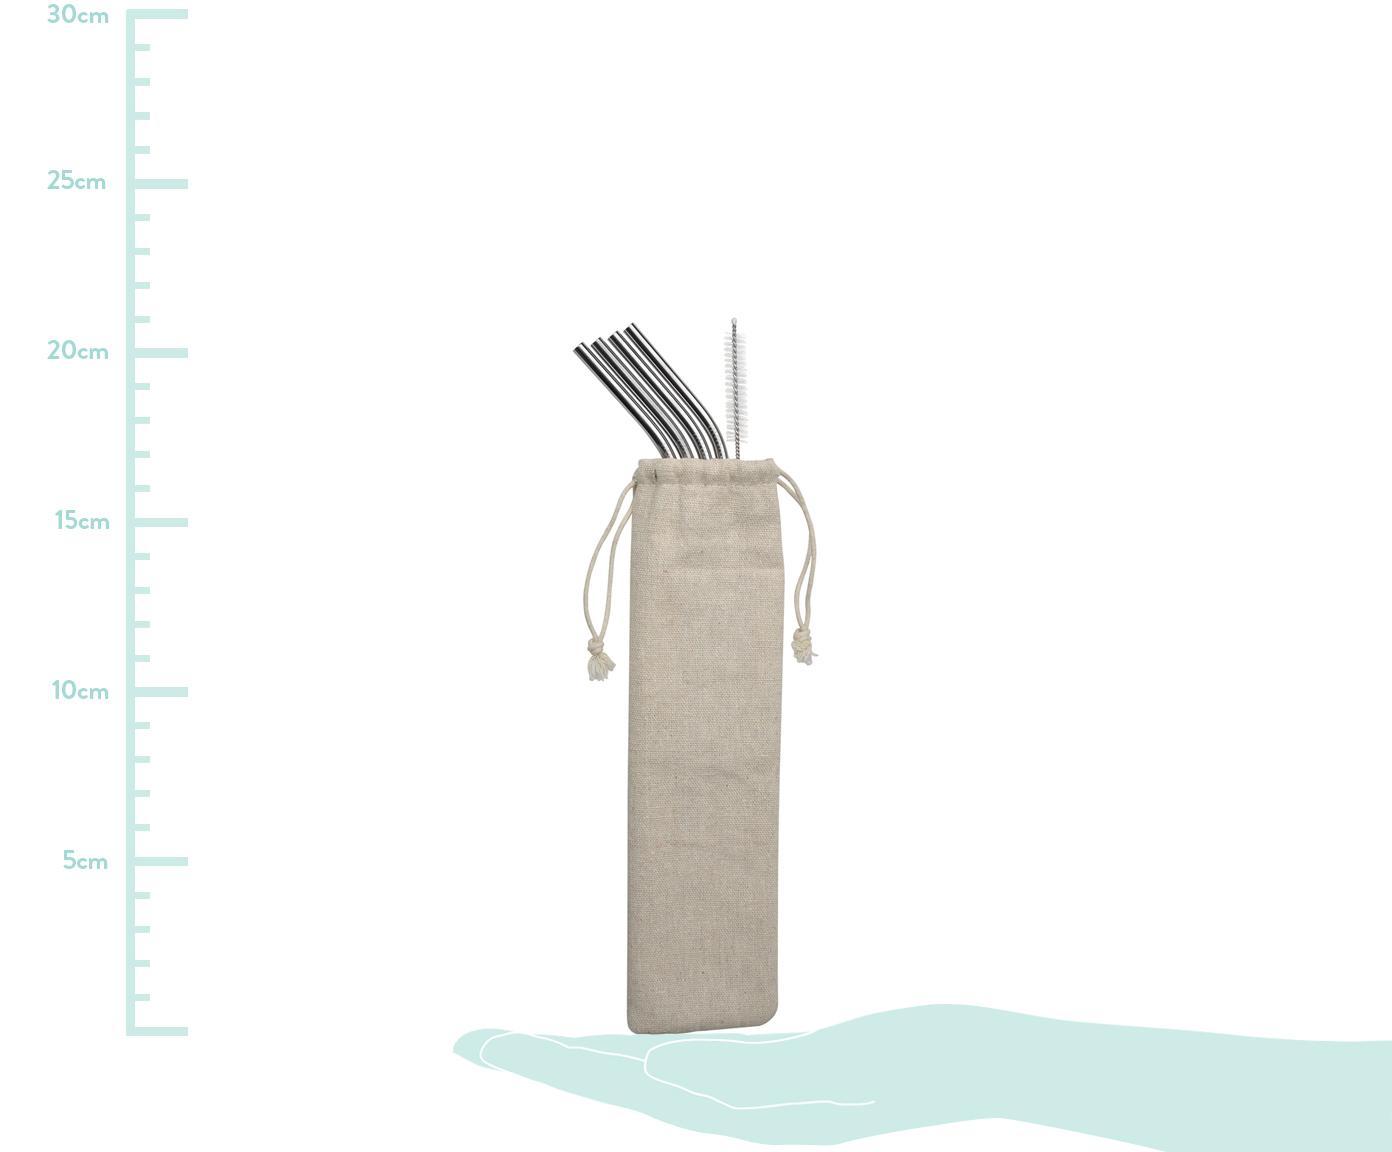 Komplet słomek Hosera, 6 elem., Stal, beżowy, D 21 cm